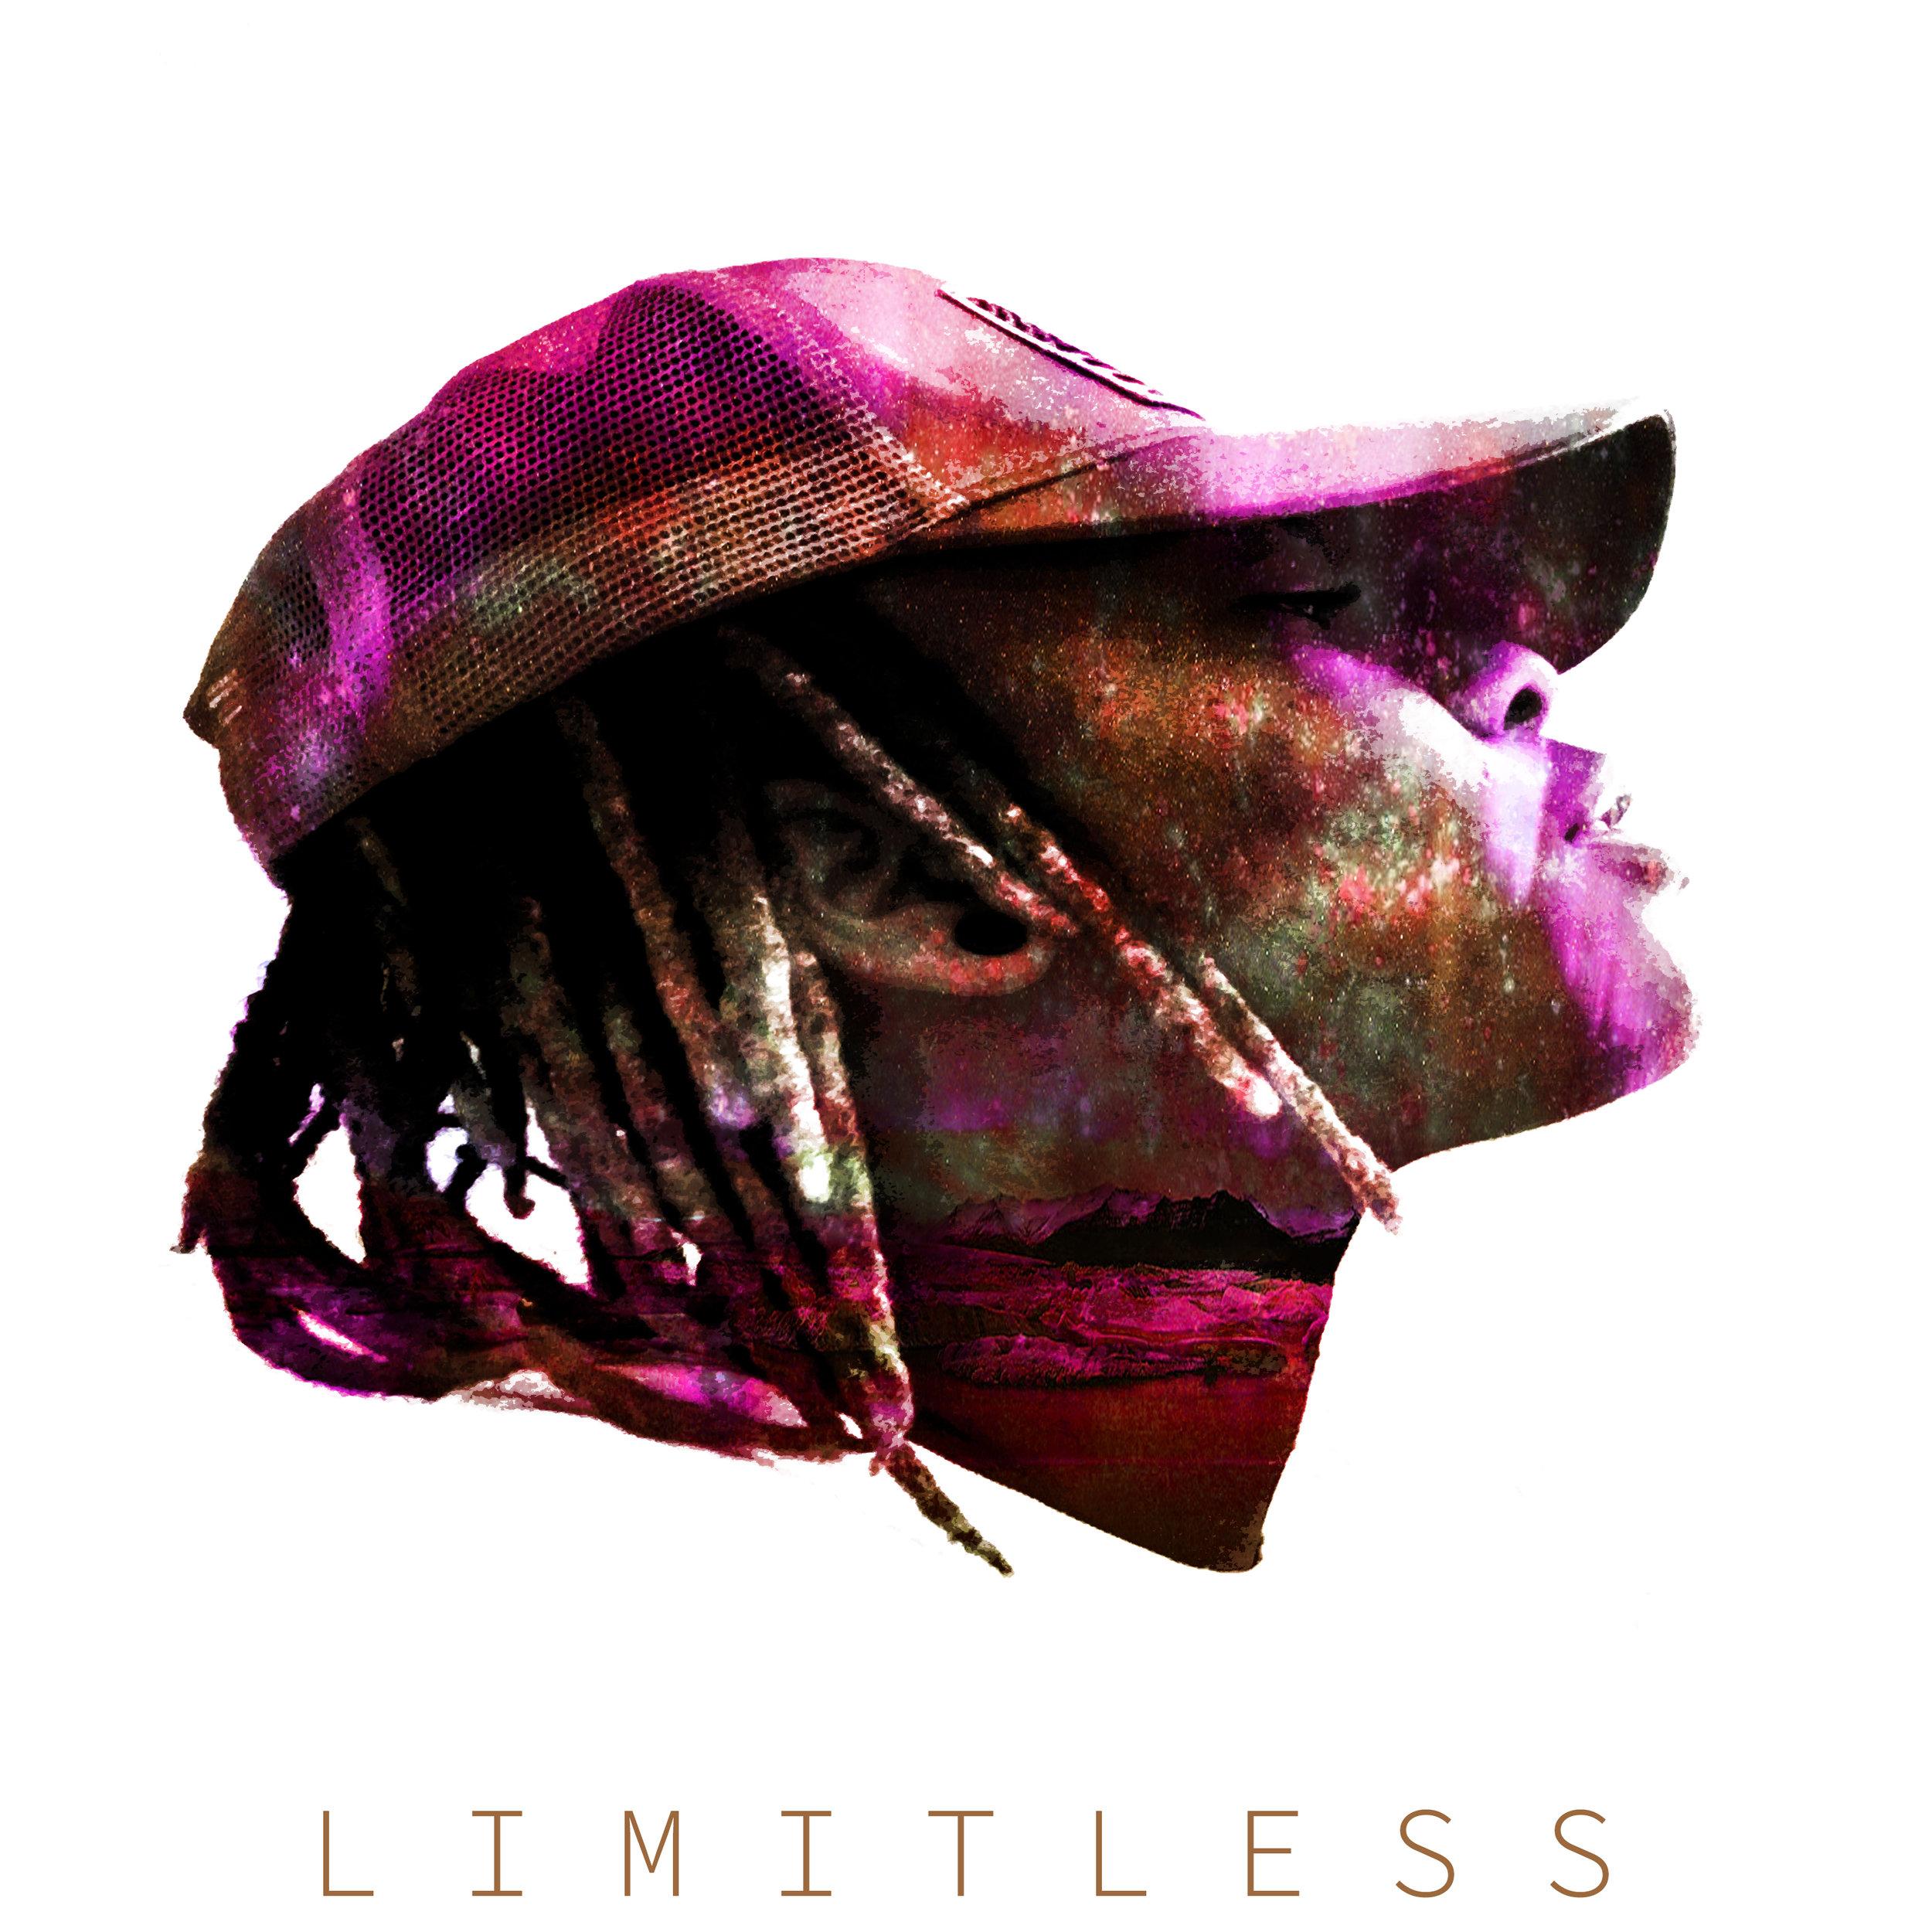 L I M I T L E S S - EP (cover).jpg